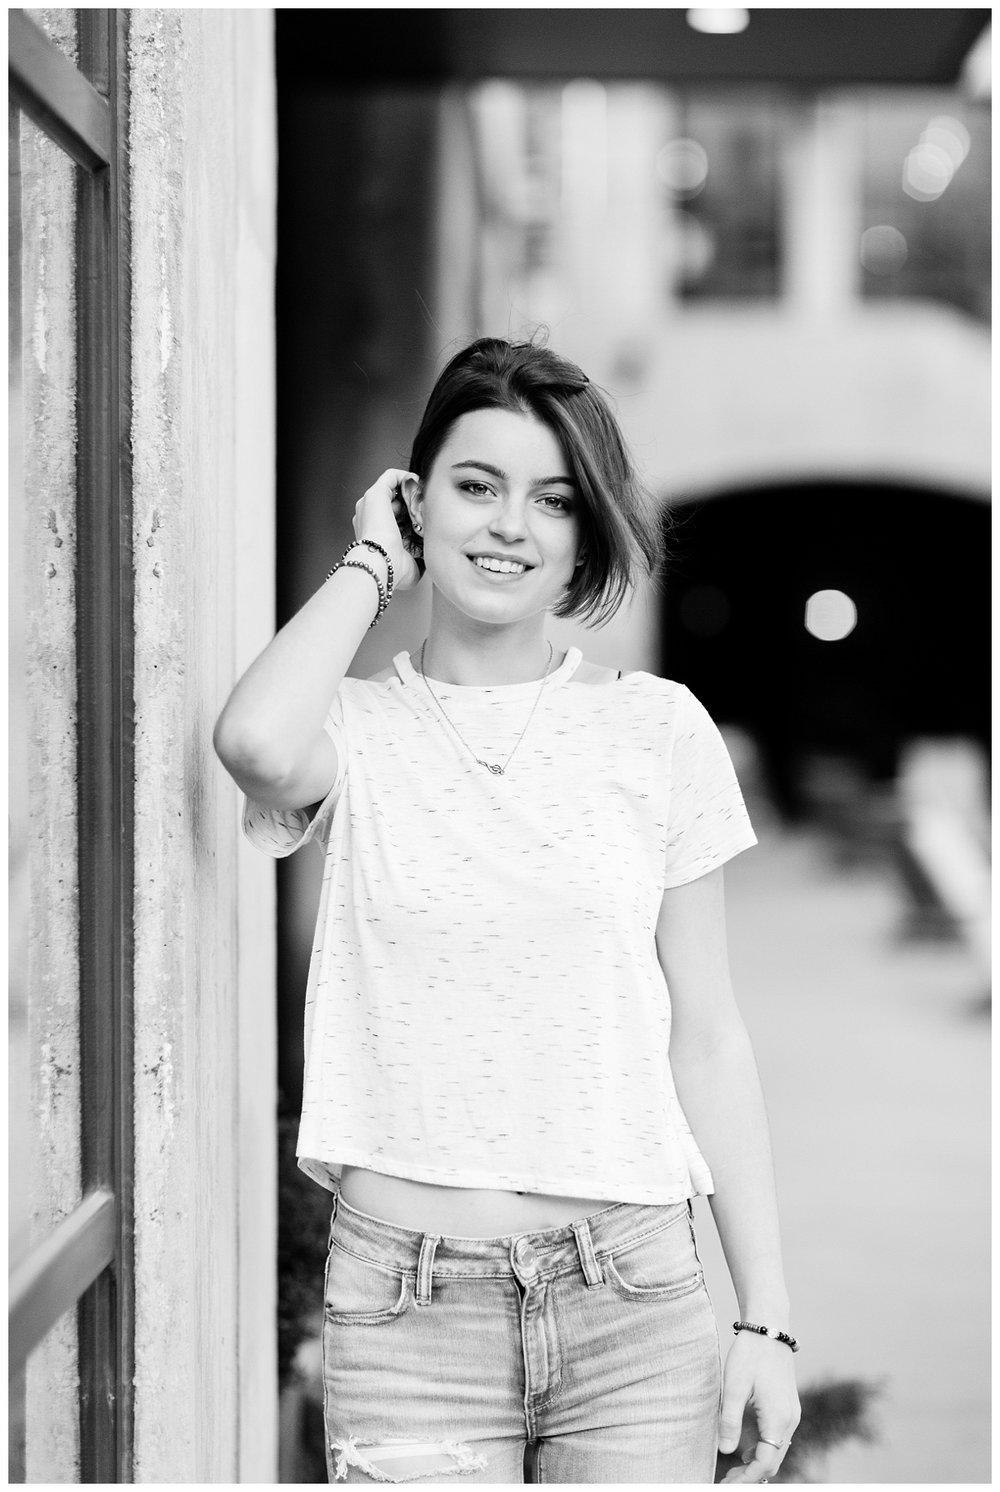 Atlanta Senior Session_Hannah_Abby Breaux Photography_Westside Provisions_0028.jpg